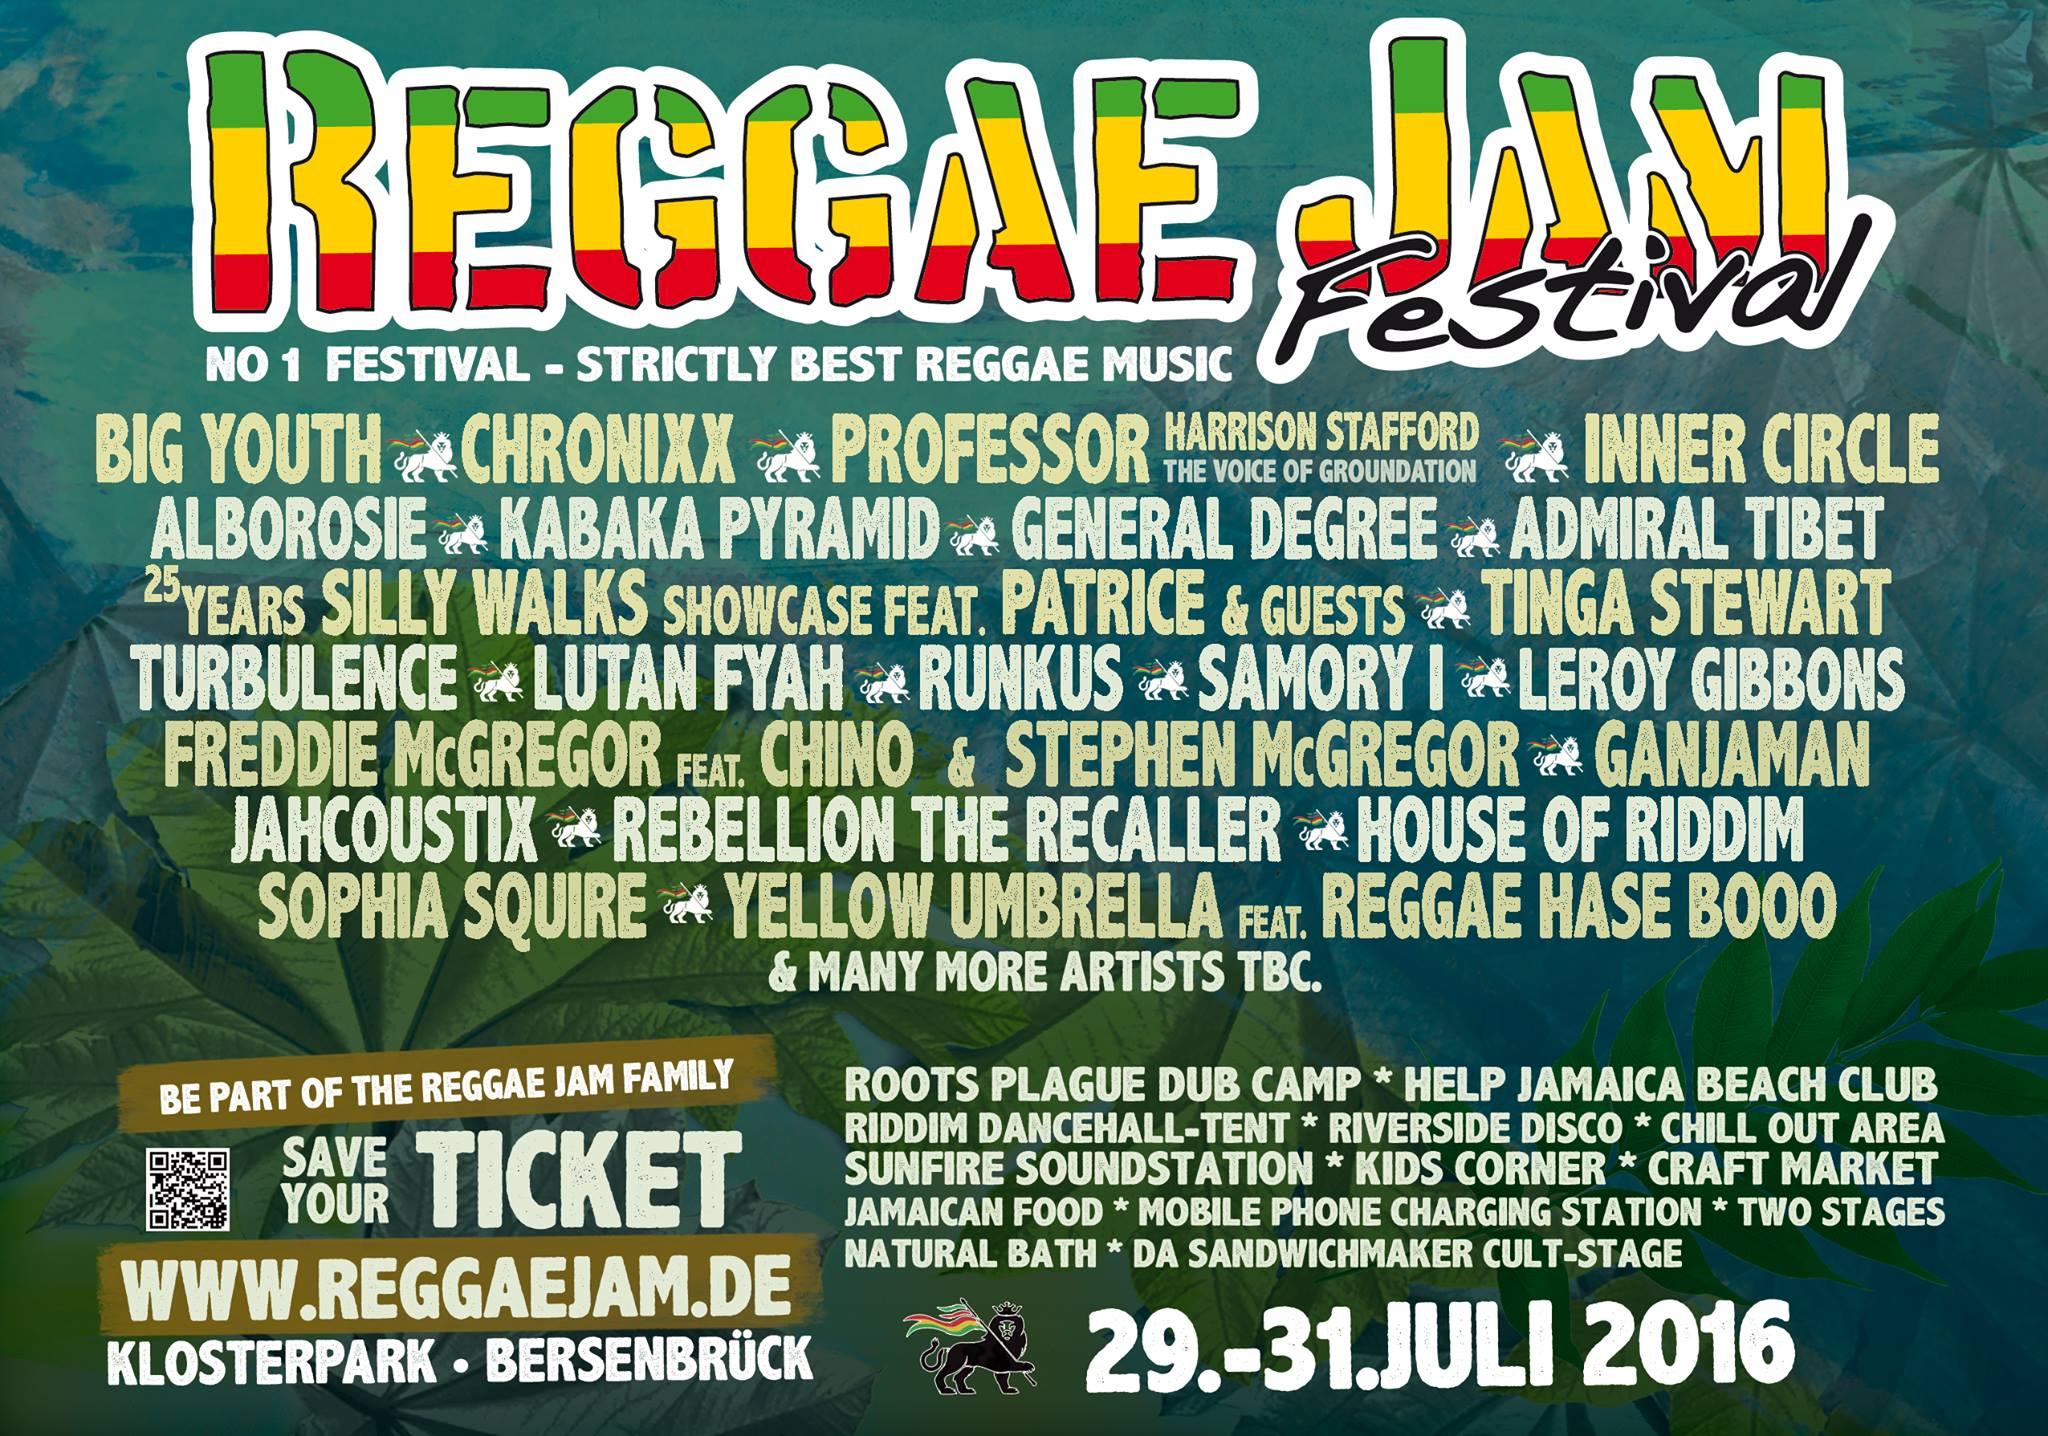 Reggae Jam 2016 Lineup